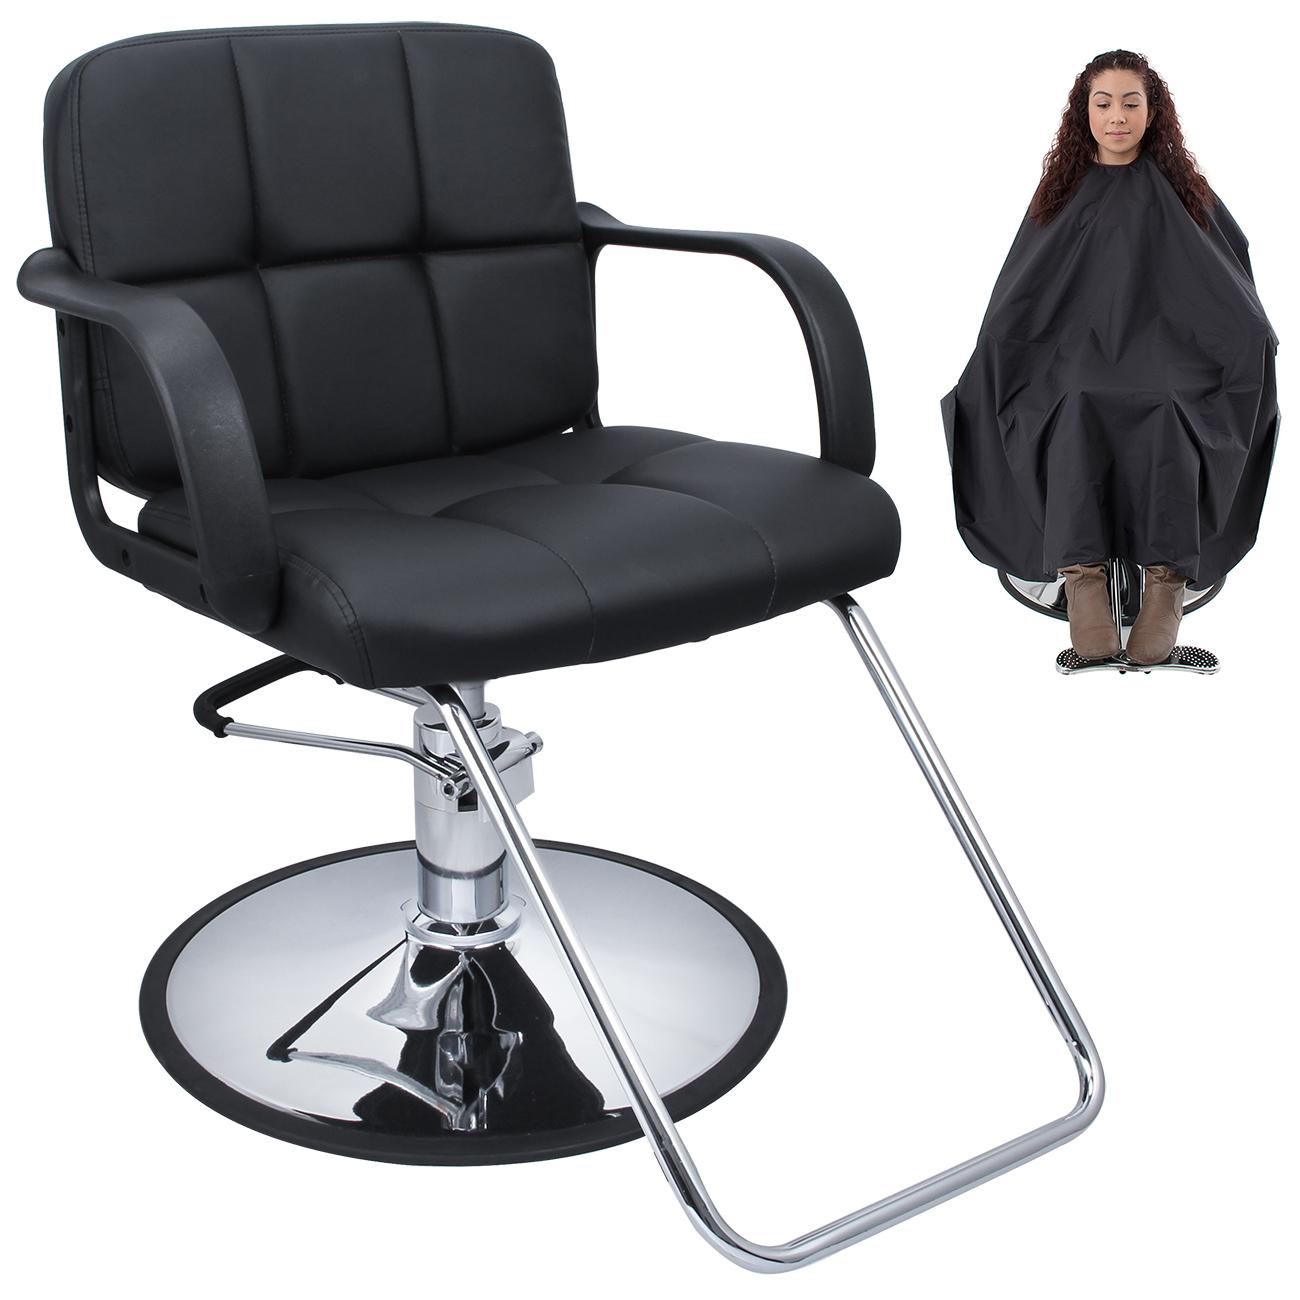 Professional Black Hydraulic Styling Barber Chair Hair ...